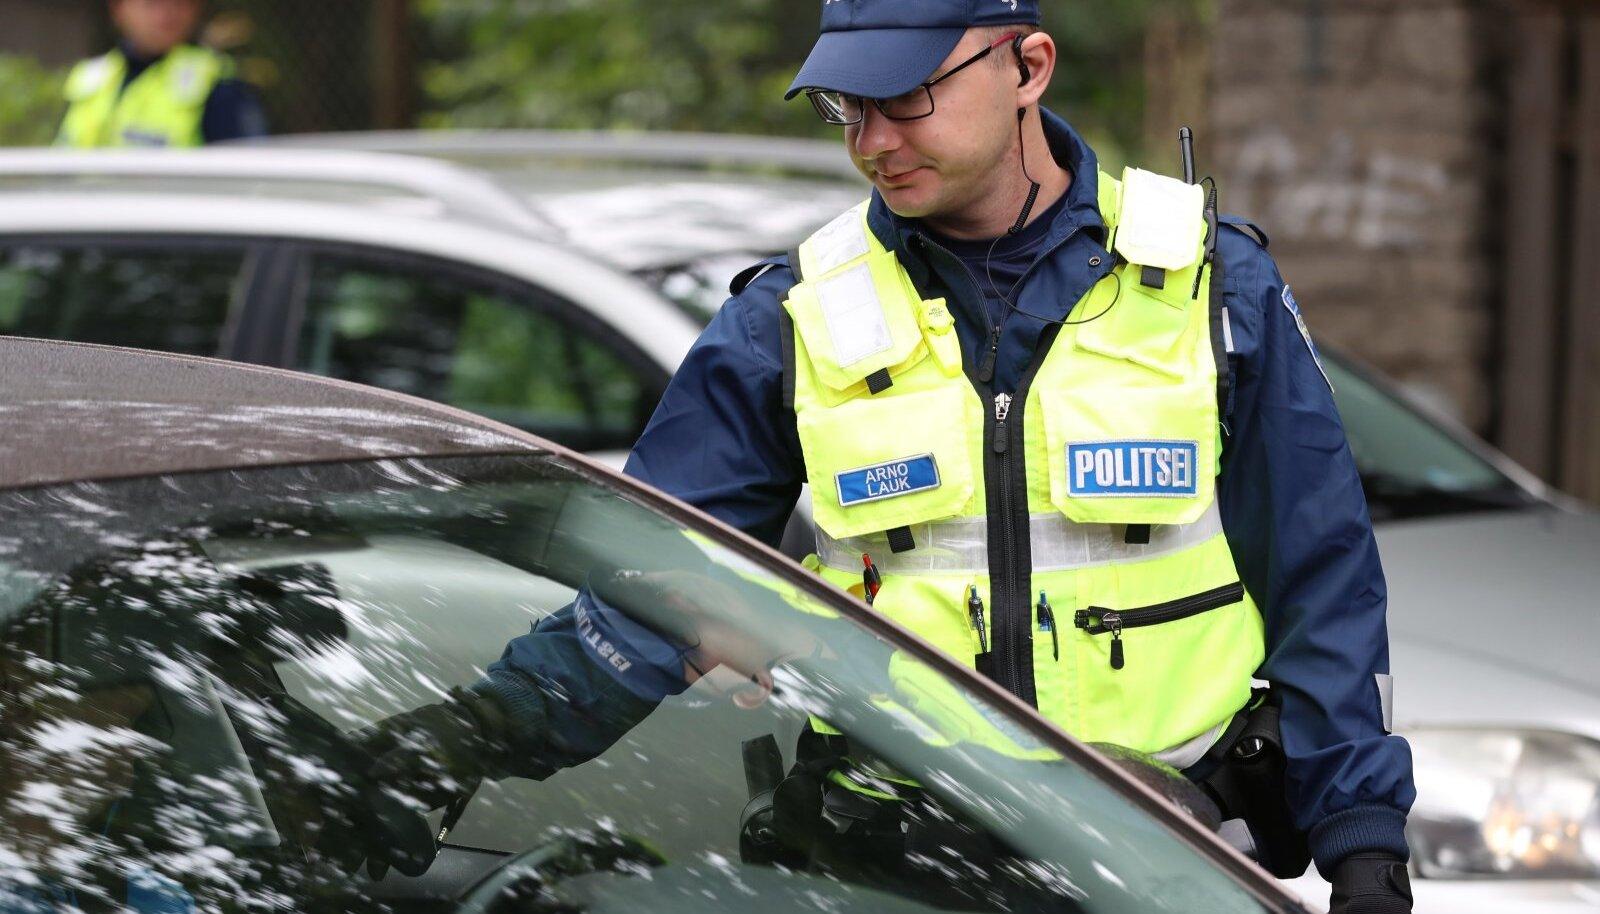 Politseinik autojuhi kainust kontrollimas (pilt on illustratiivne).